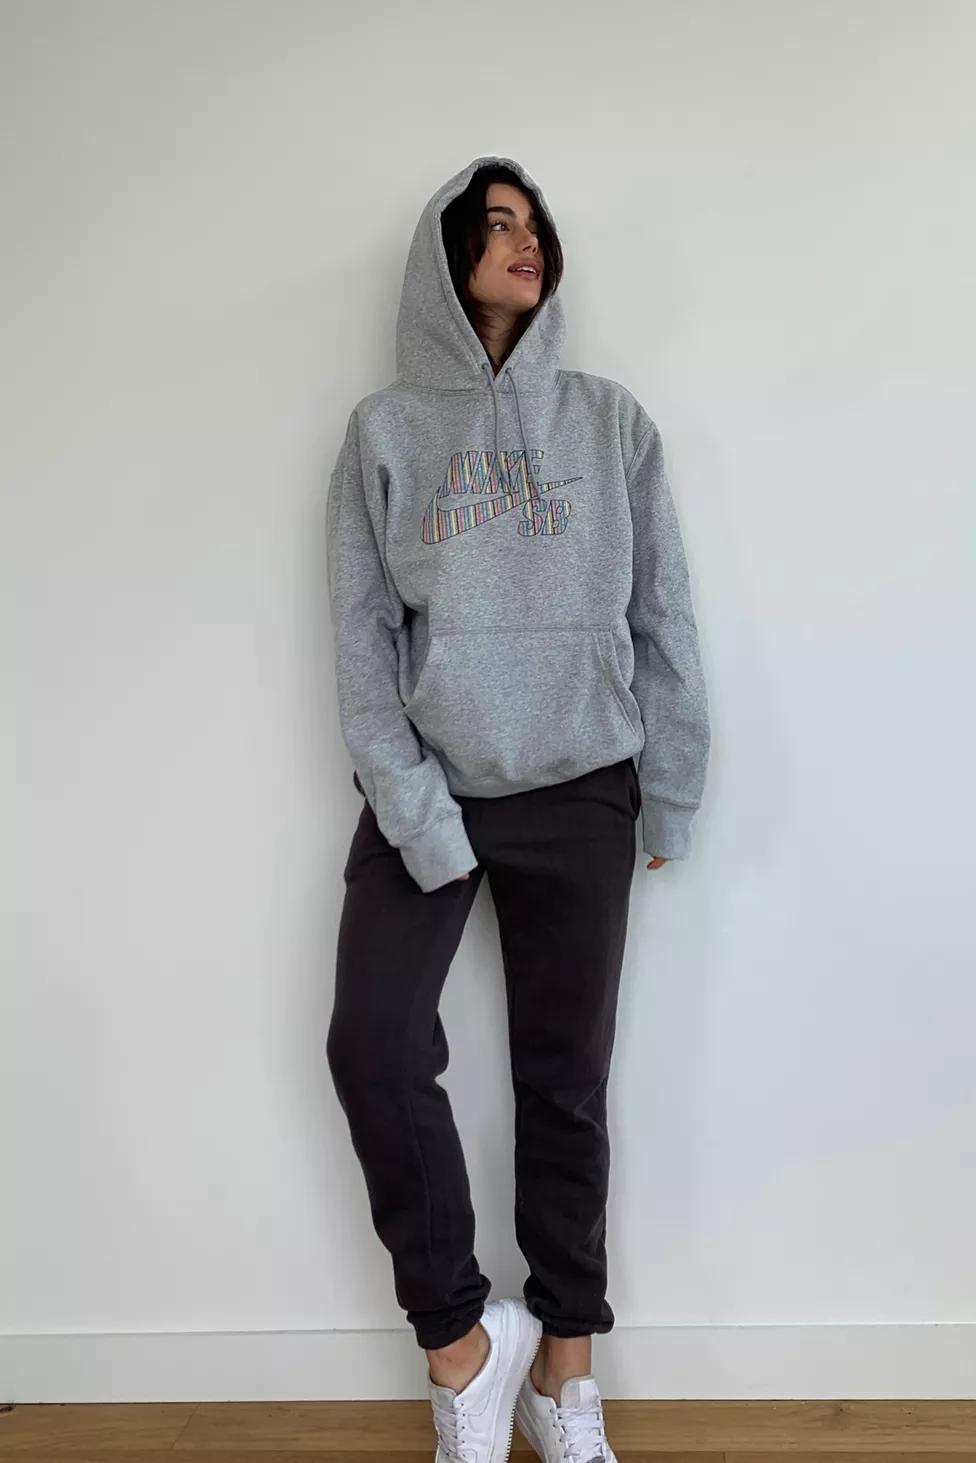 Nike Skateboard Striped Logo Hoodie Sweatshirt Urban Outfitters Sweatshirts Hoodie Sweatshirts Hoodies [ 1463 x 976 Pixel ]